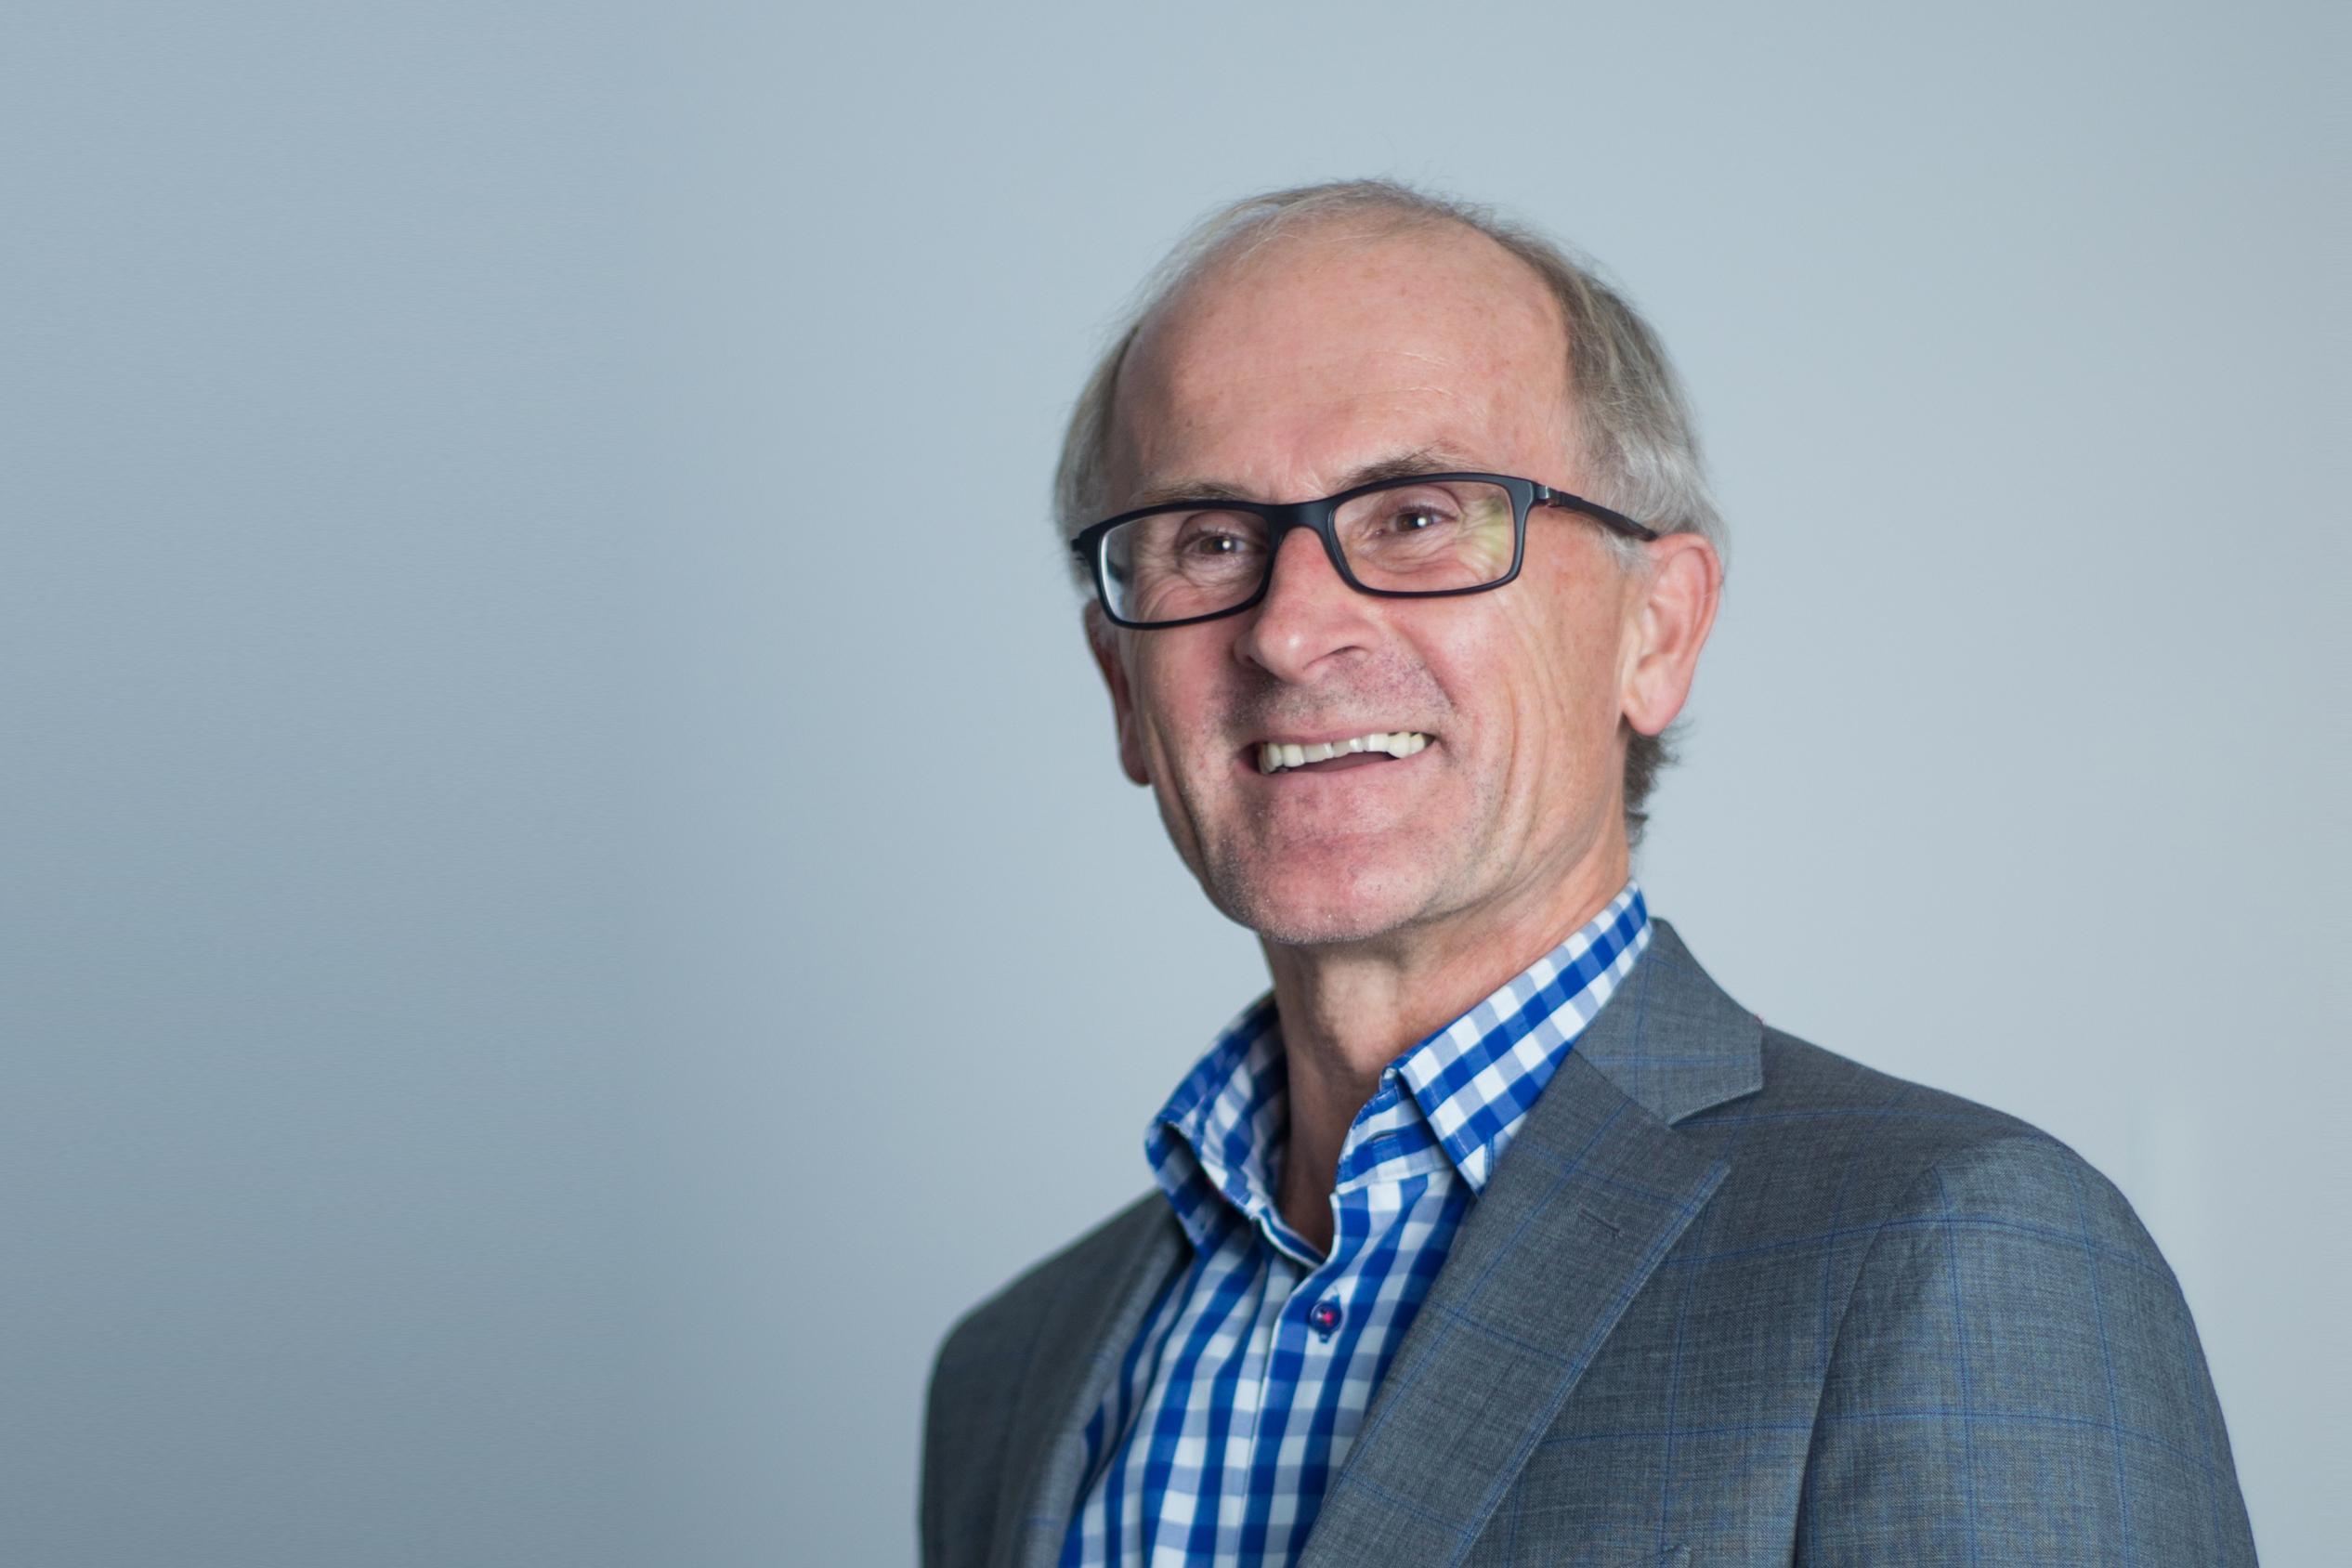 Piet Meij